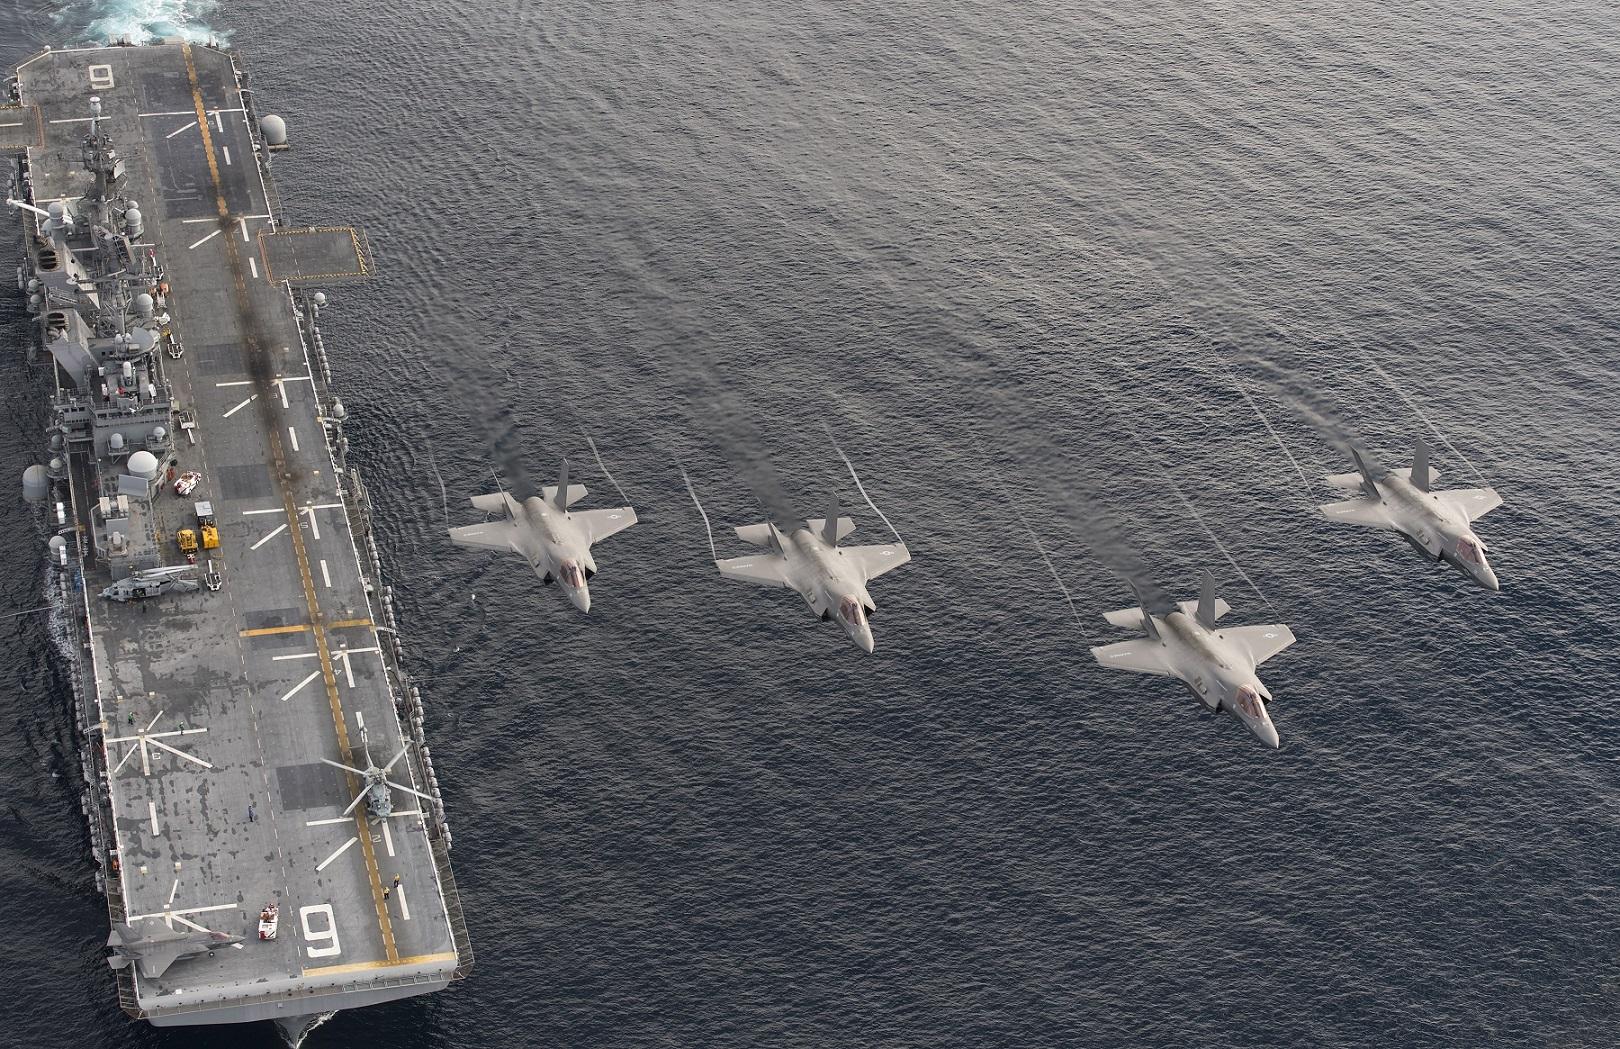 F-35B Lightning II • Aboard Amphibious Assault Ship • USS Makin Island Northern Edge 2021